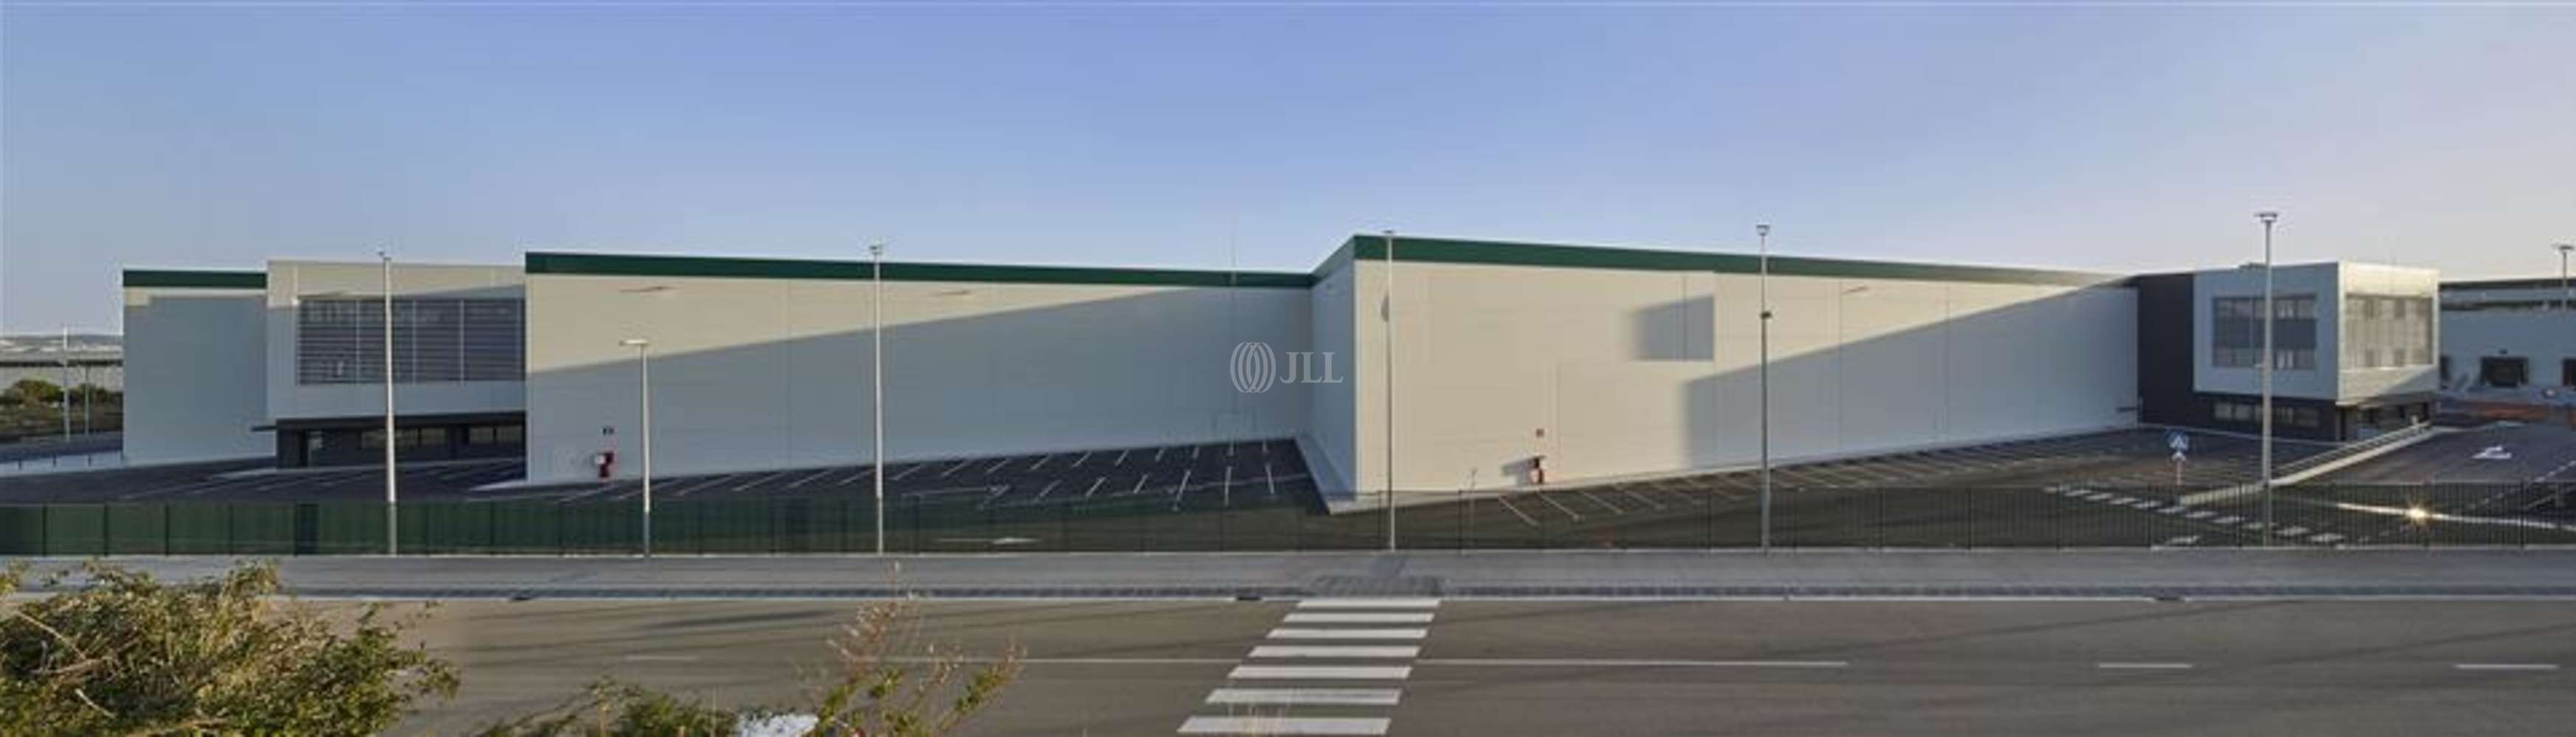 Naves industriales y logísticas La bisbal del penedès, 43717 - Nave Logistica - B0376 - PI LES PLANES - 10535